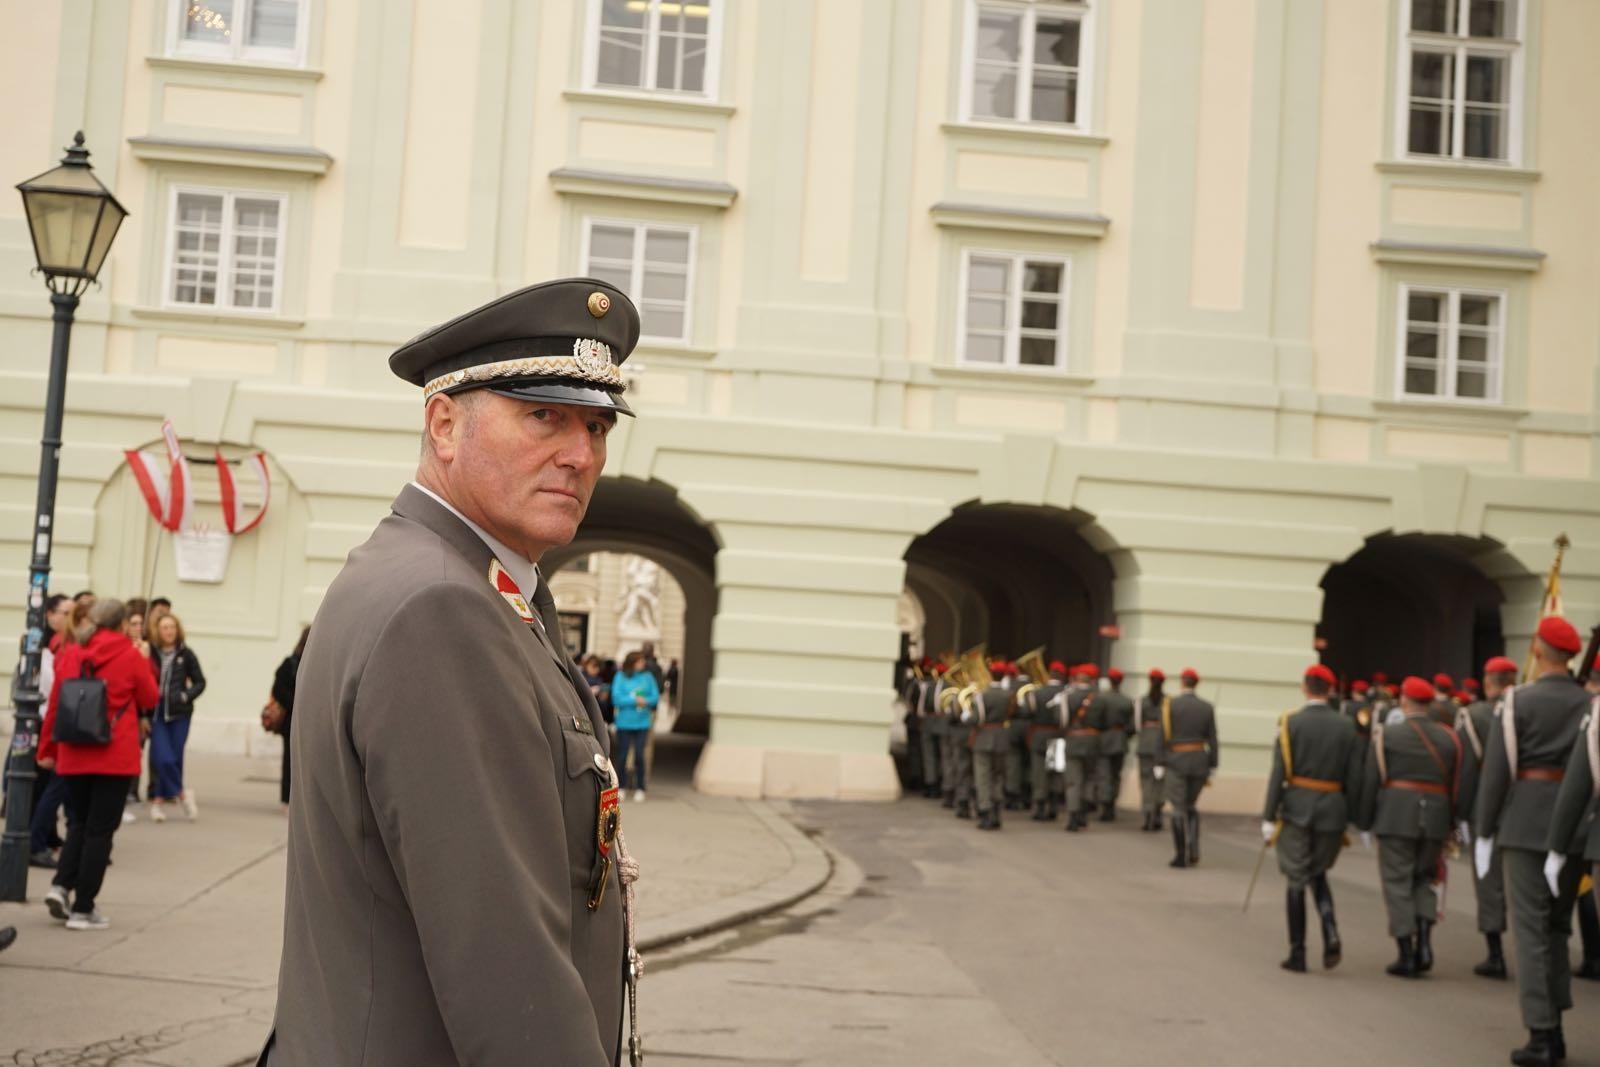 2019_04_03_4Gardekompanie_Tschechien_VdB - 10 of 46